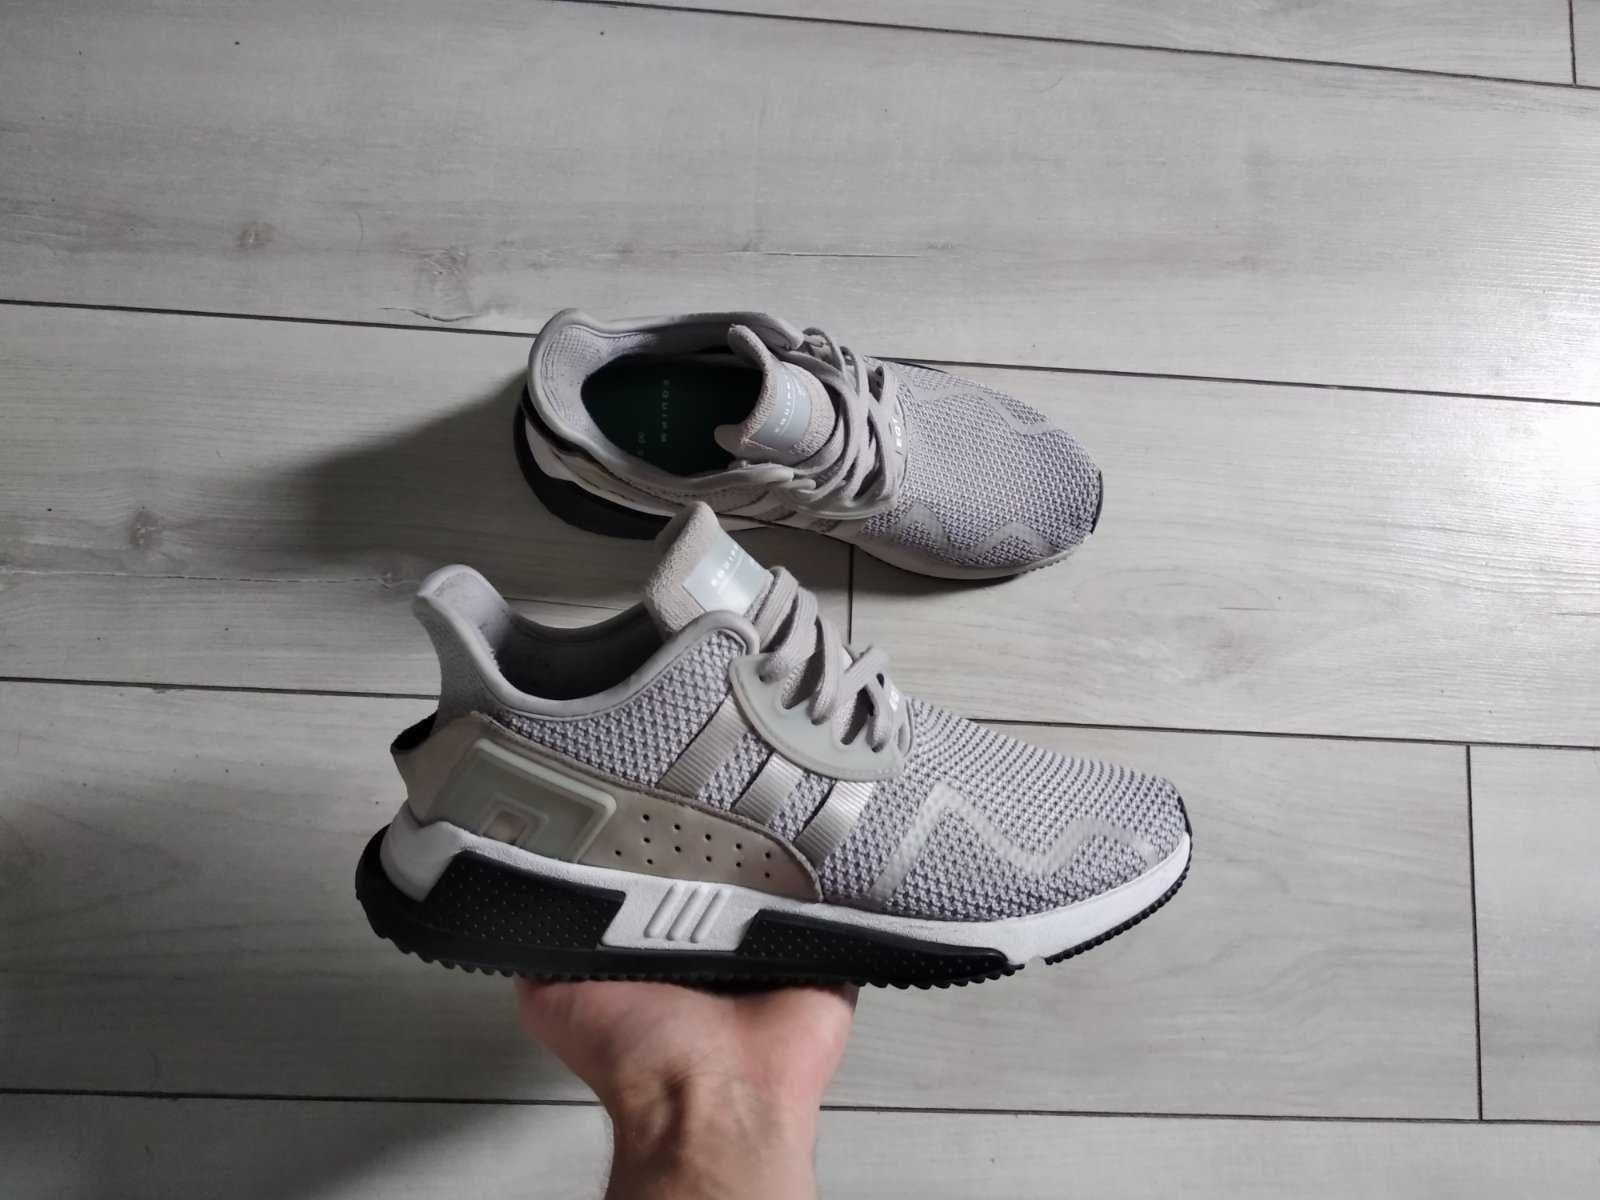 42р, новые кроссовки Adidas EQT ADV Exclusive